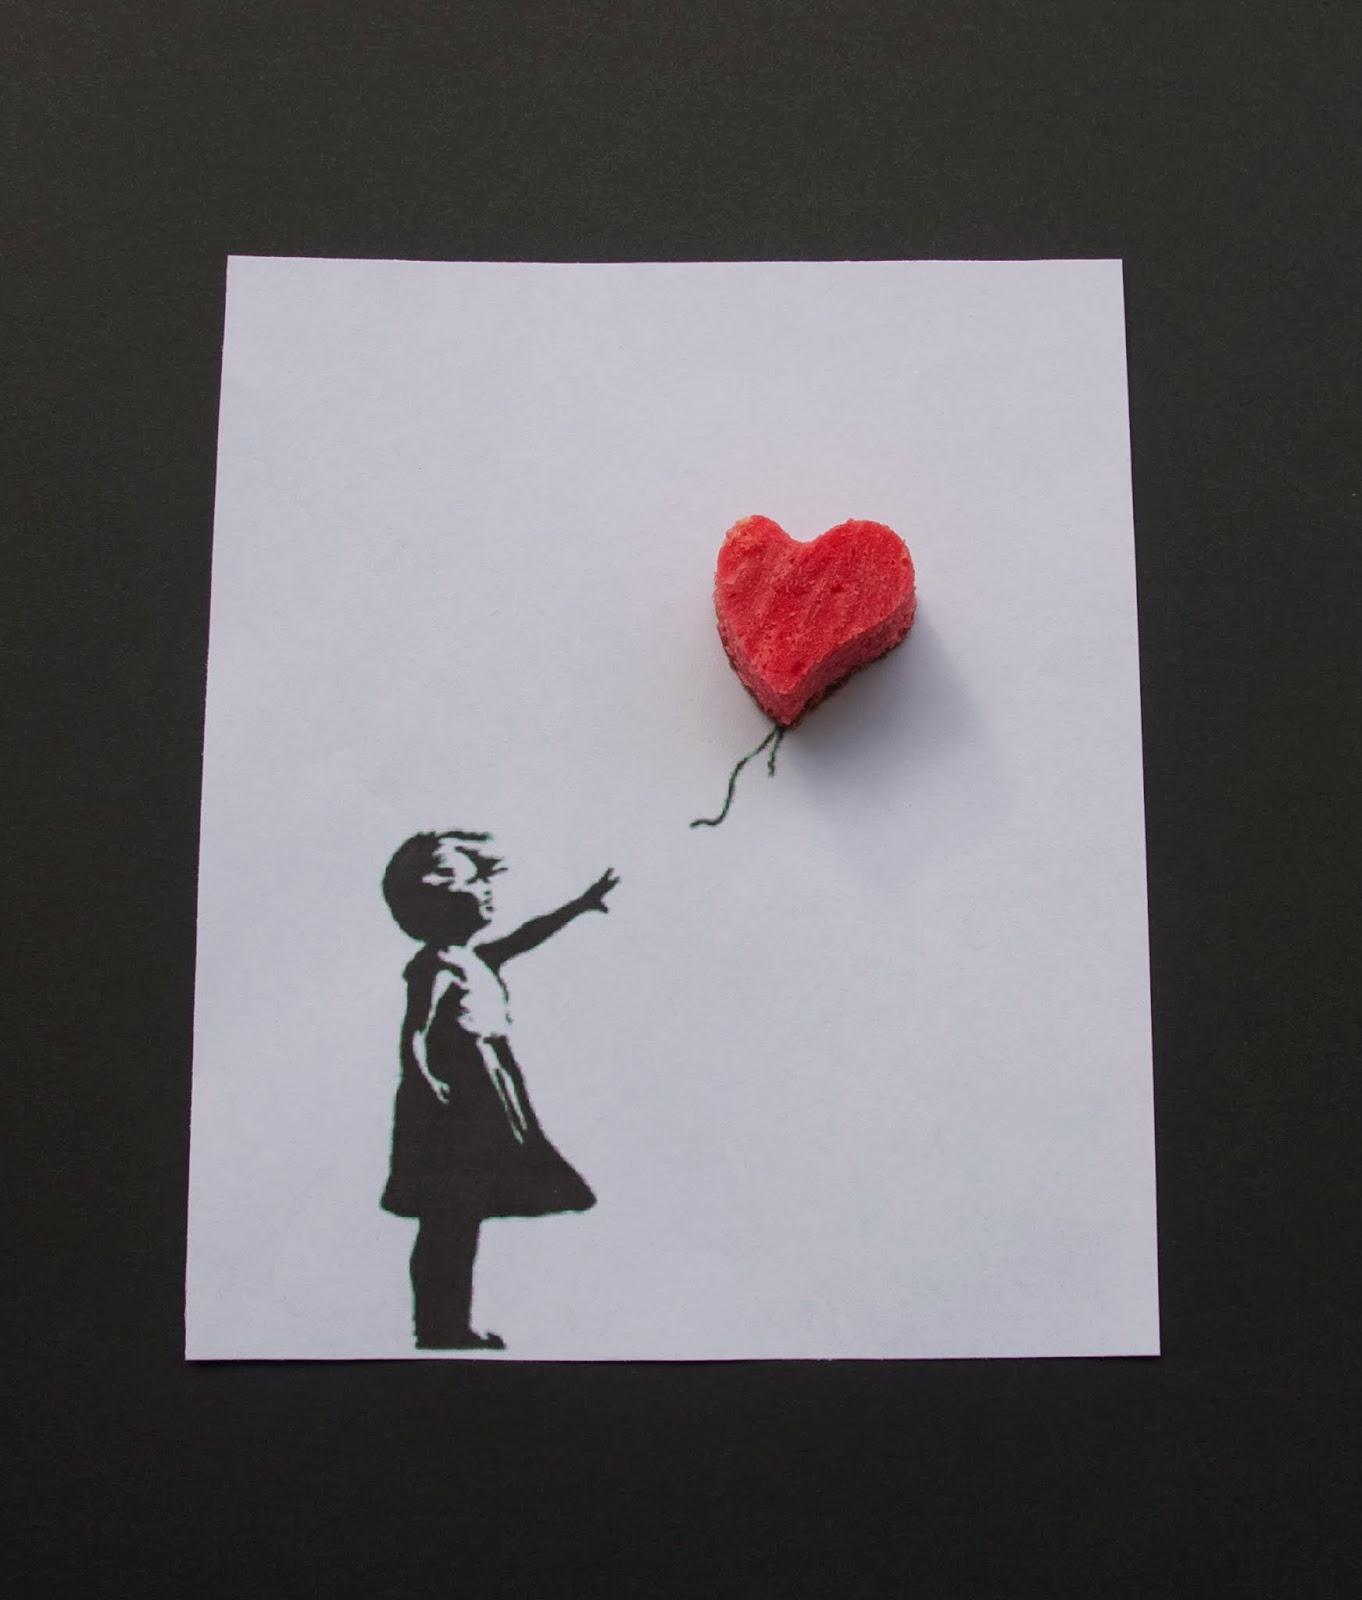 Imatge de la nena de Banksy amb cor de cheescake red velvet brownie